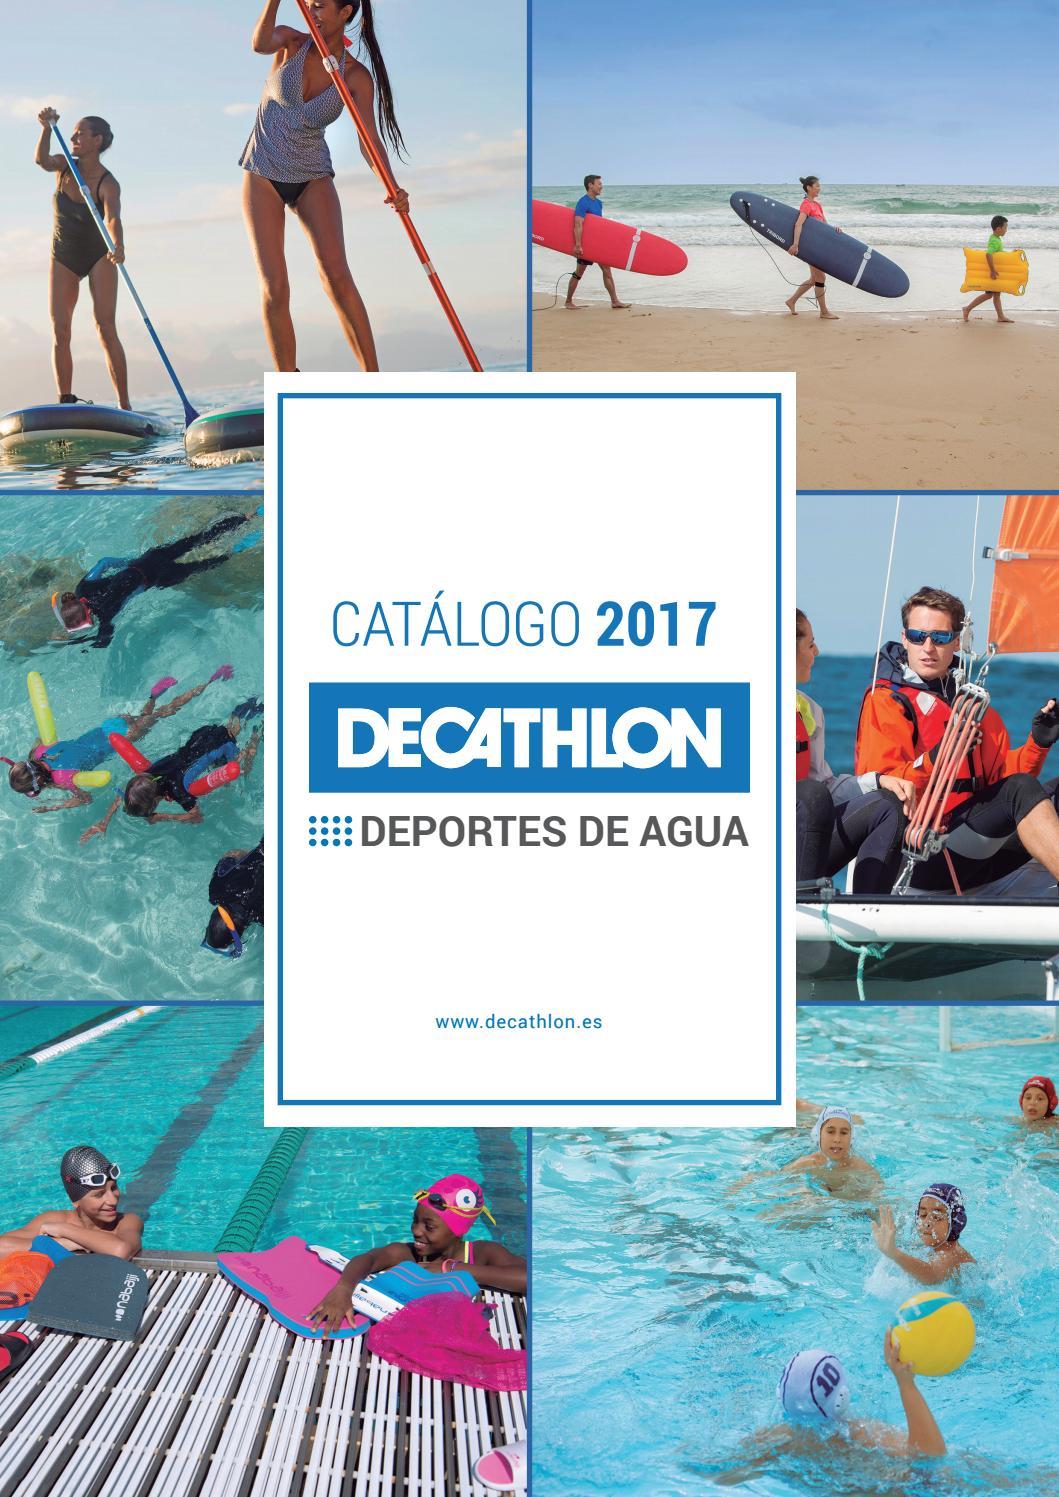 CATÁLOGO DEPORTES DE AGUA DECATHLON 2017 by Decathlon España - issuu ec4e650feab